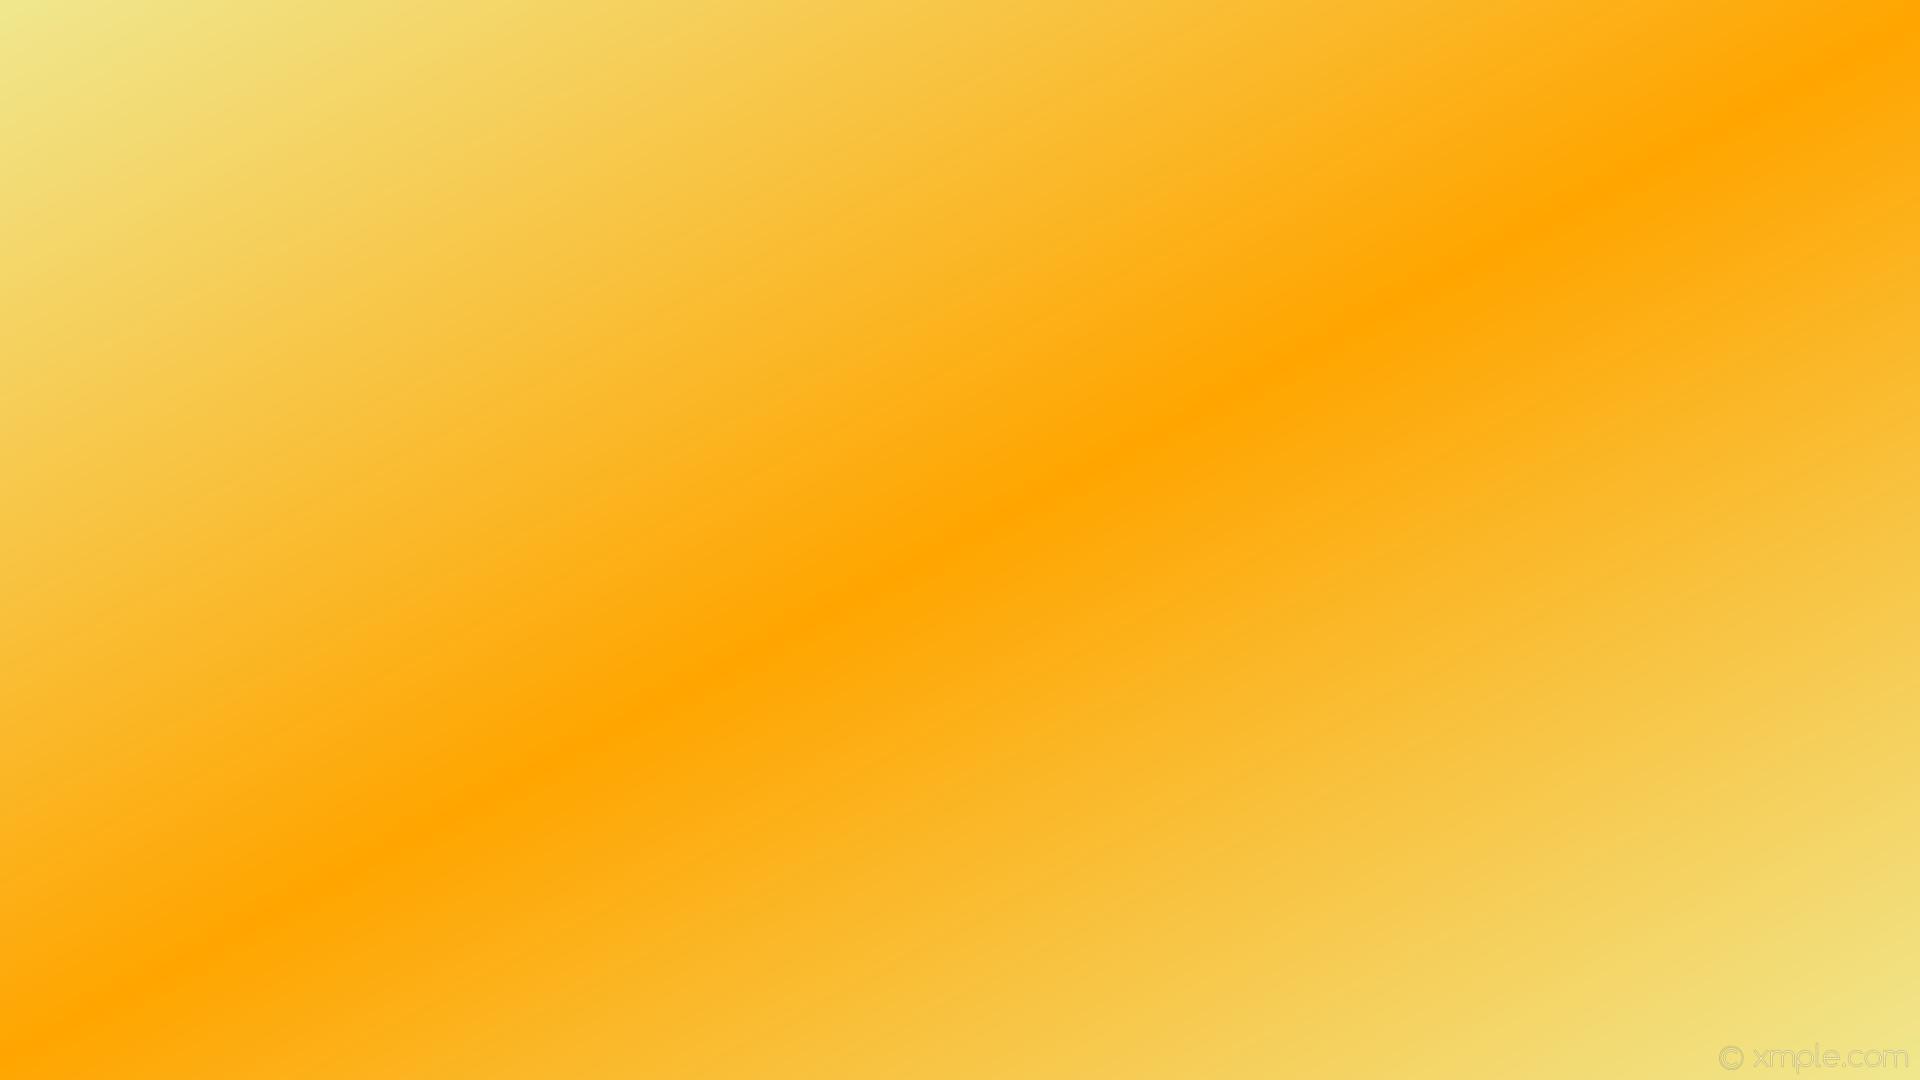 wallpaper orange gradient highlight linear yellow khaki #f0e68c #ffa500  330° 50%